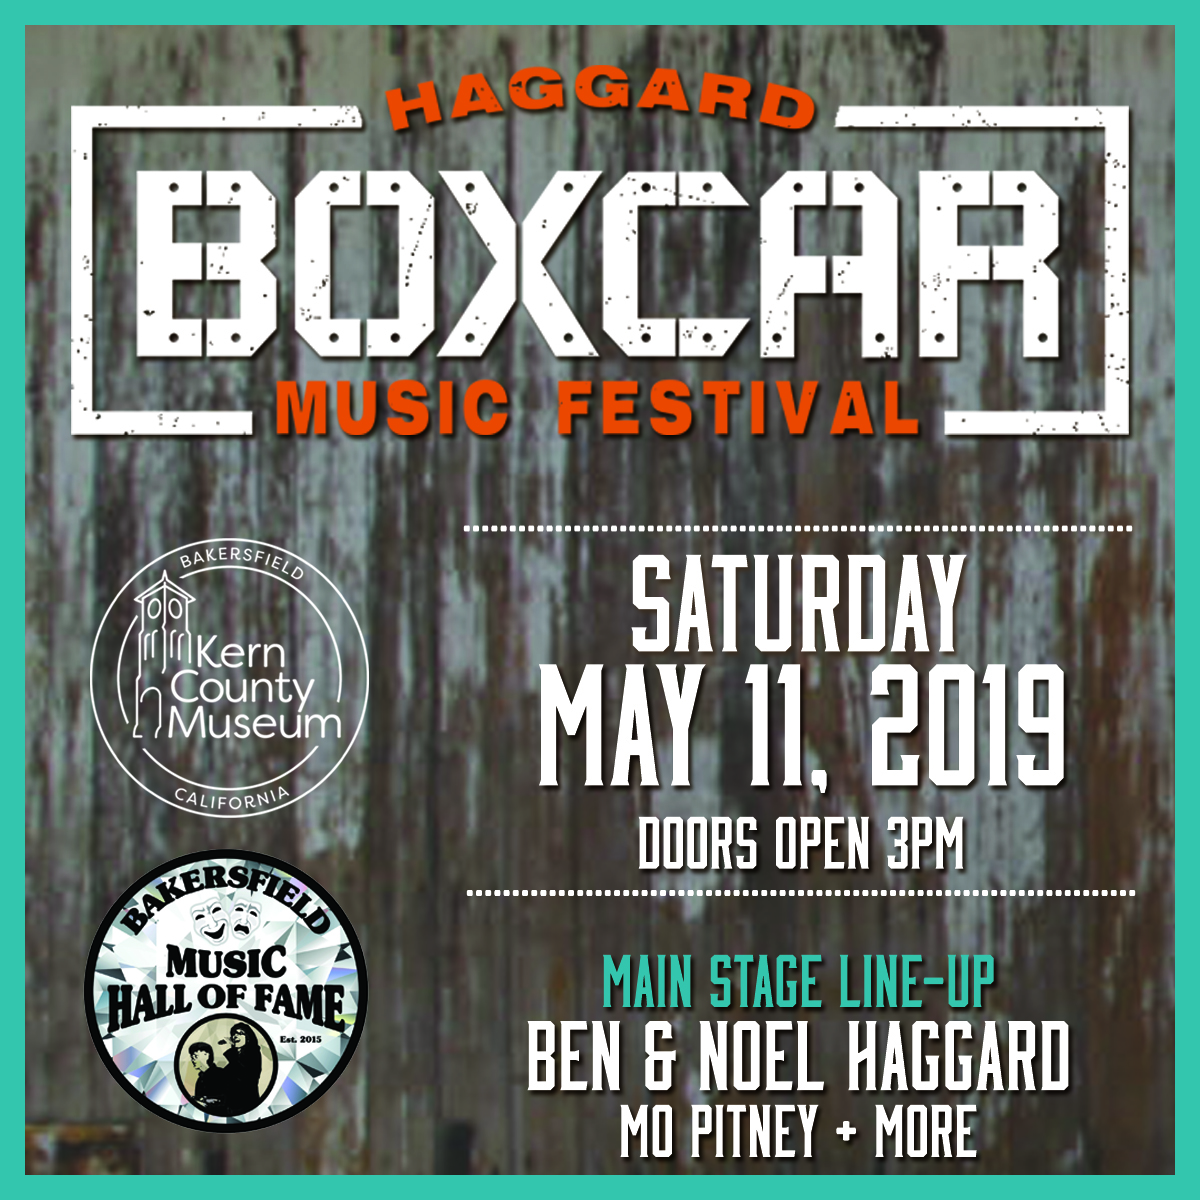 Box_Car_Social_Eventbrite.jpg